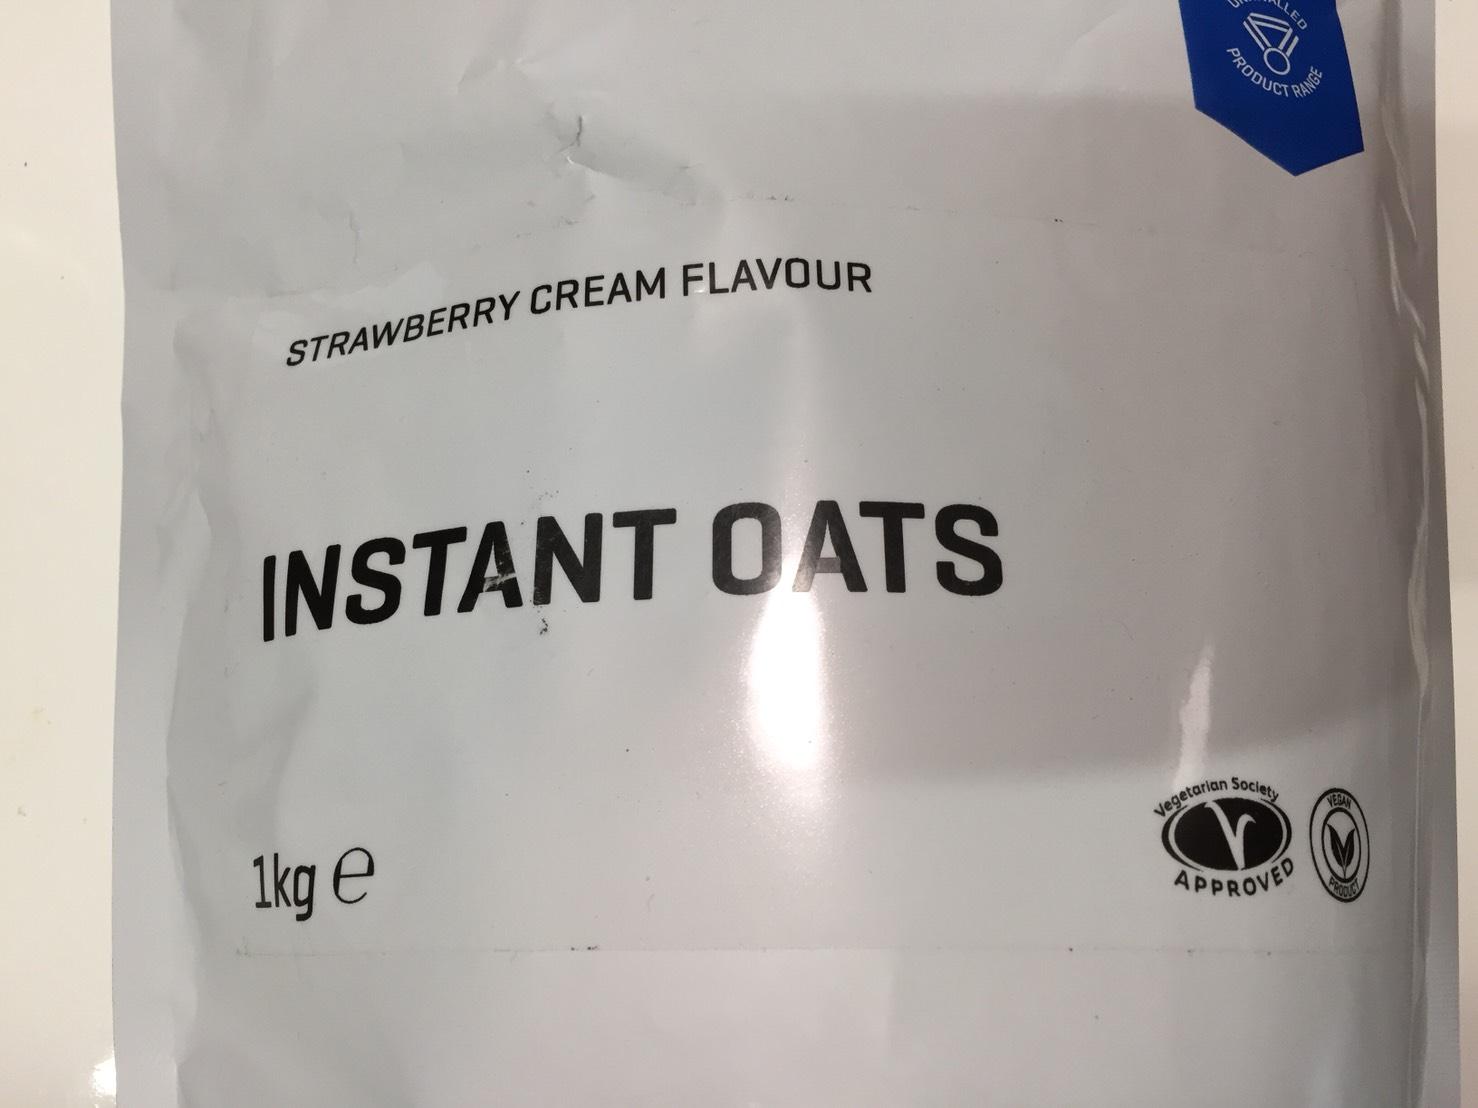 INSTANT OATS(インスタントオーツ)「STRAWBERRY CREAM FLAVOUR(ストロベリークリーム味)」